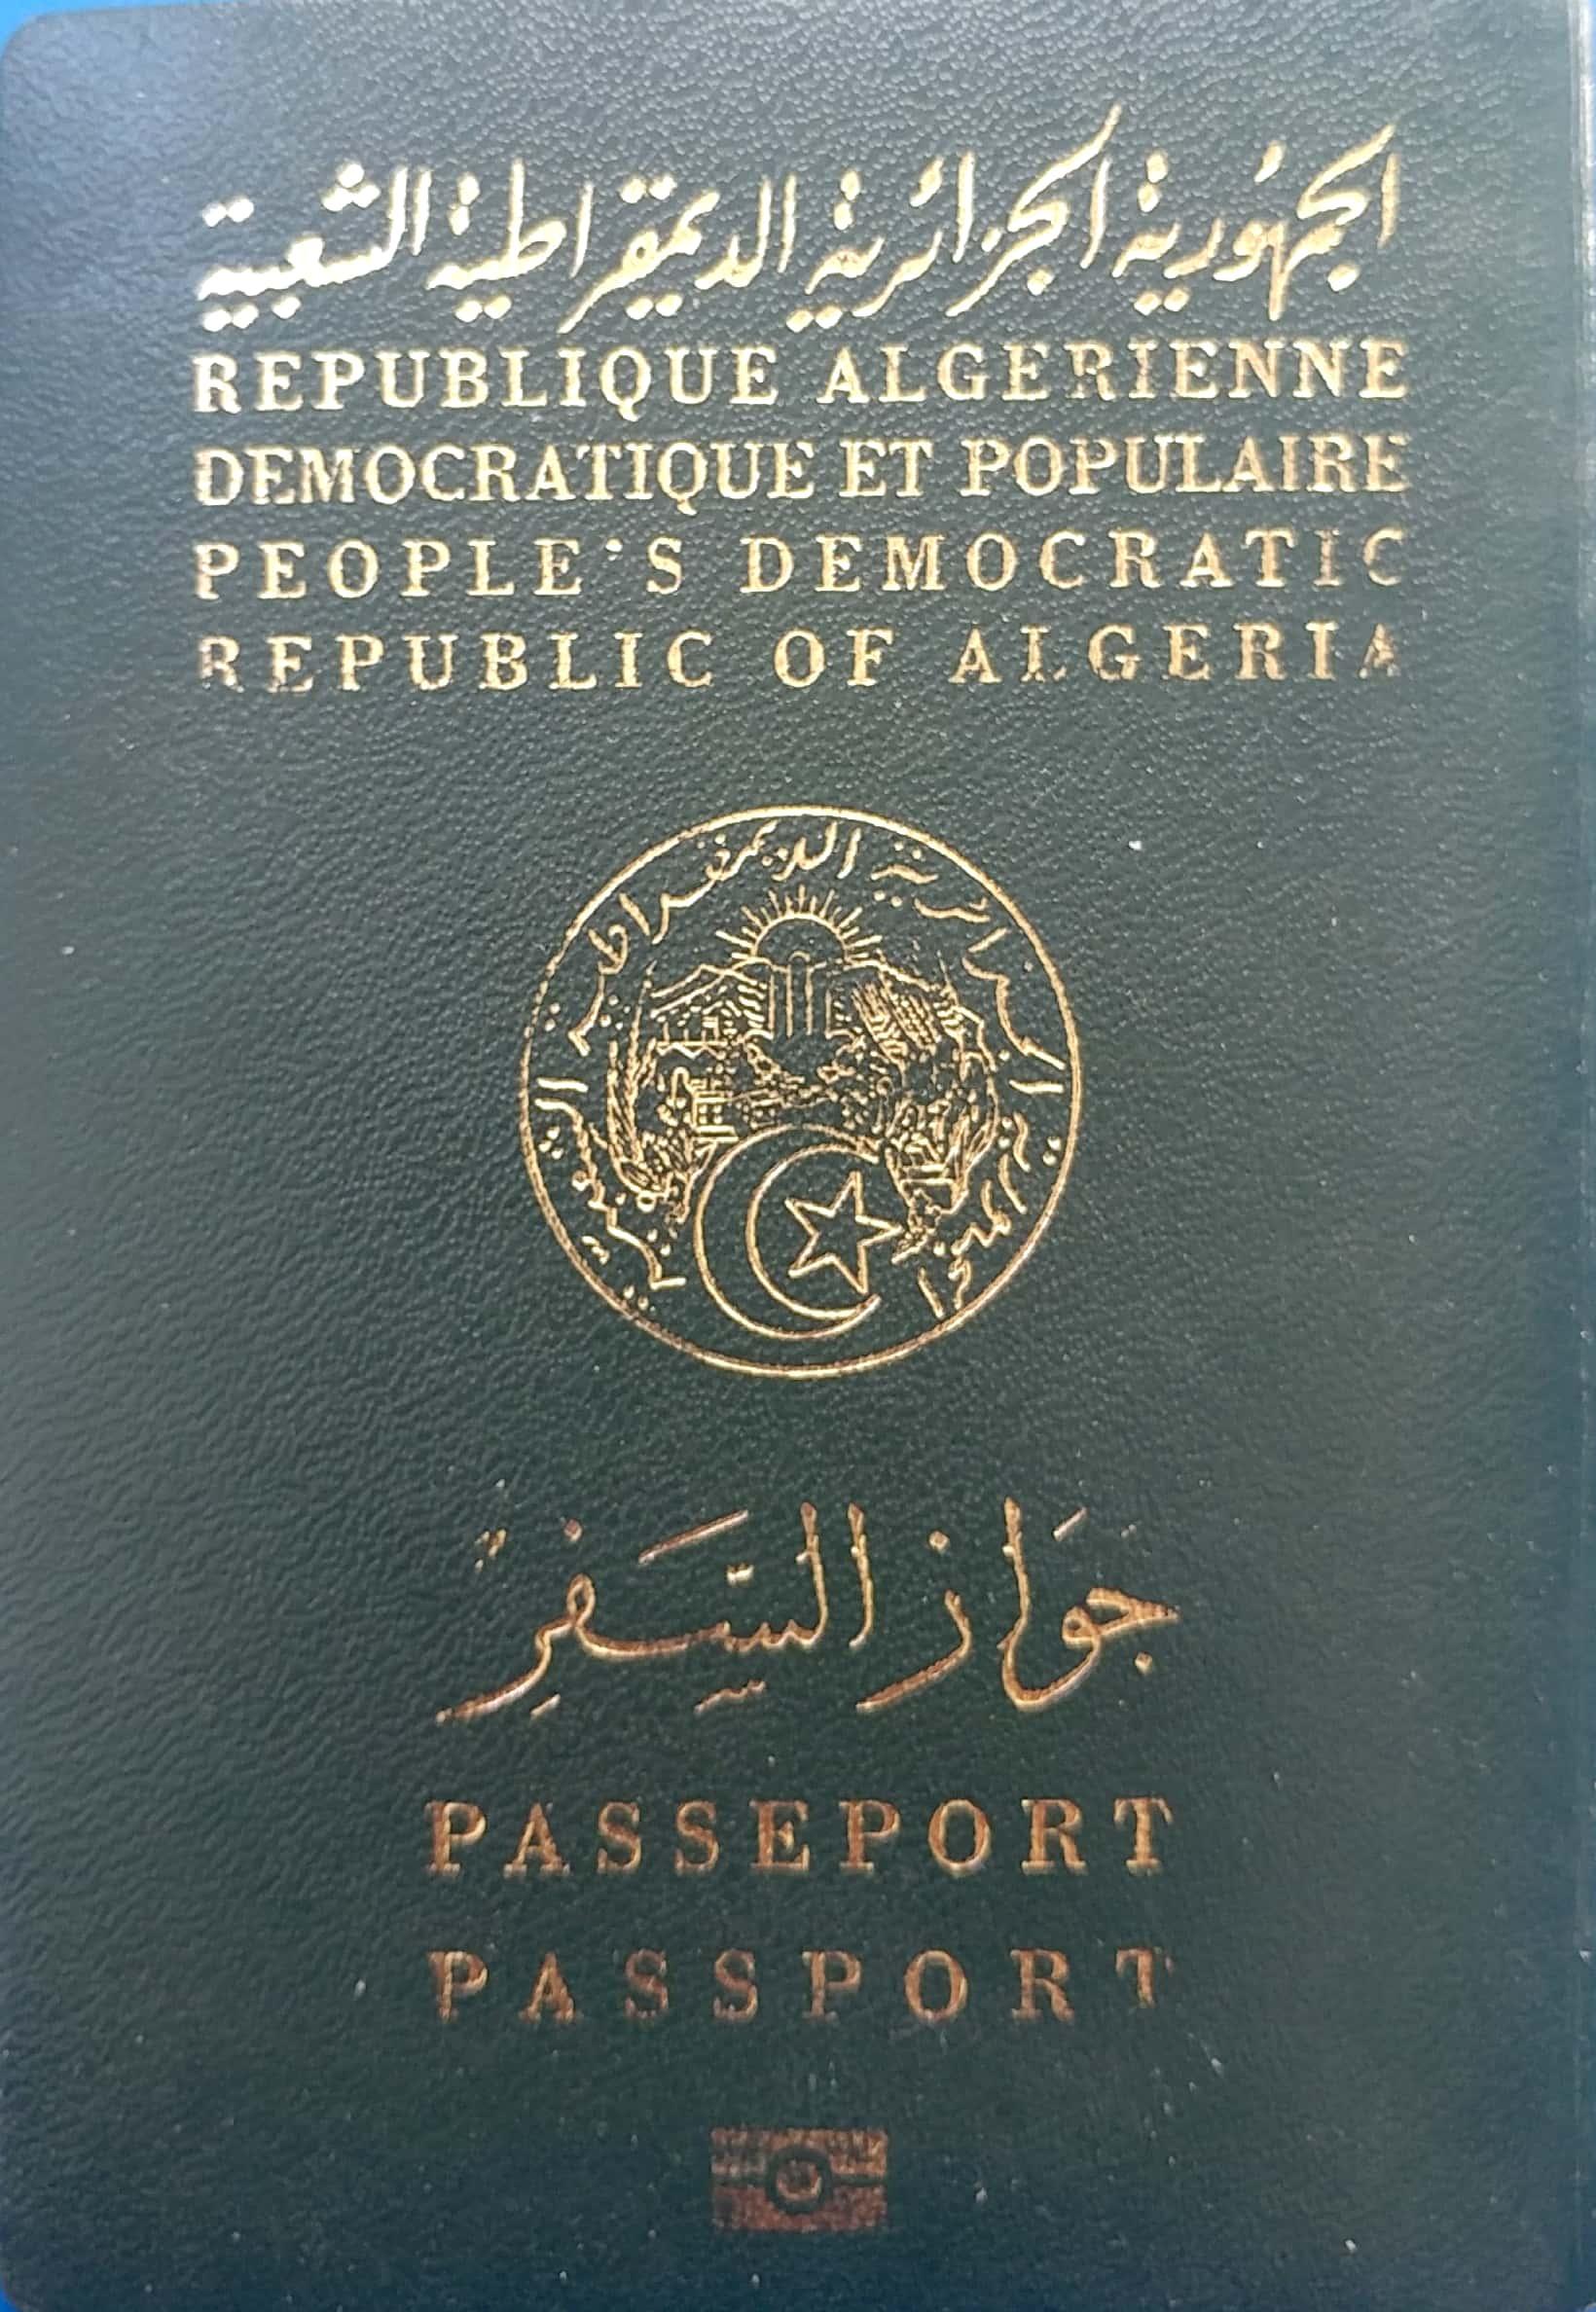 Carte Identite Algerienne Validite.Passeport Algerien Wikipedia